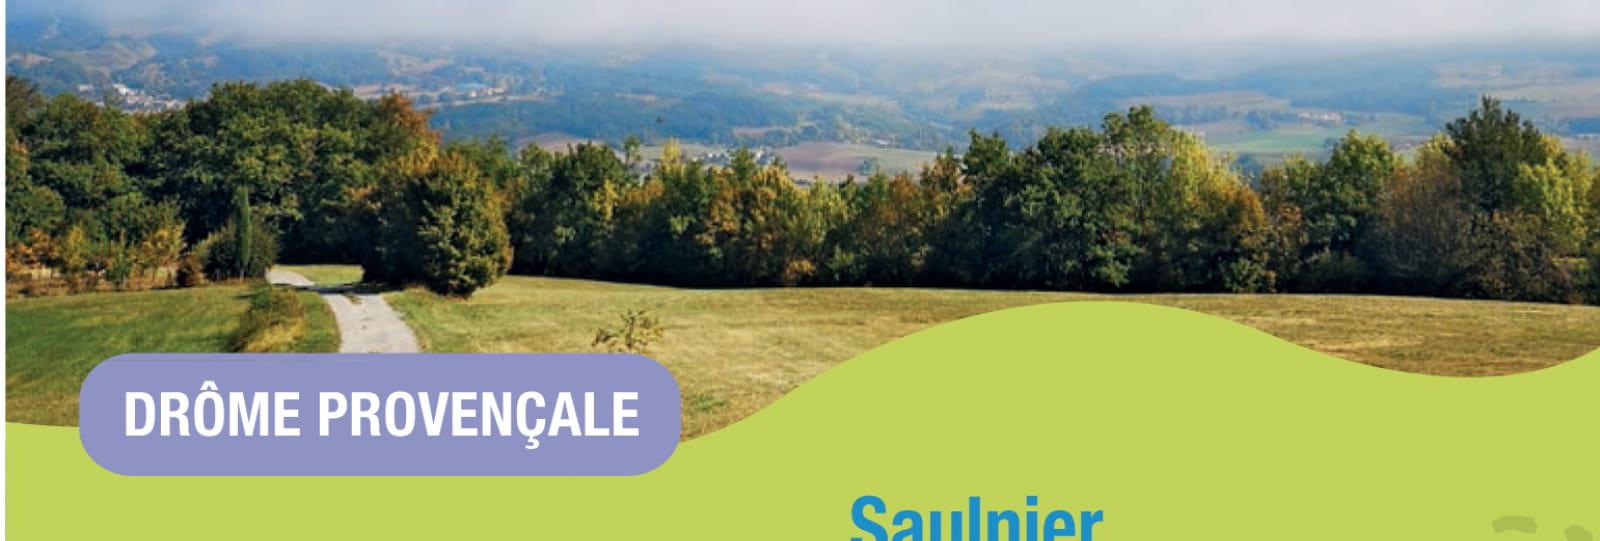 Saulnier